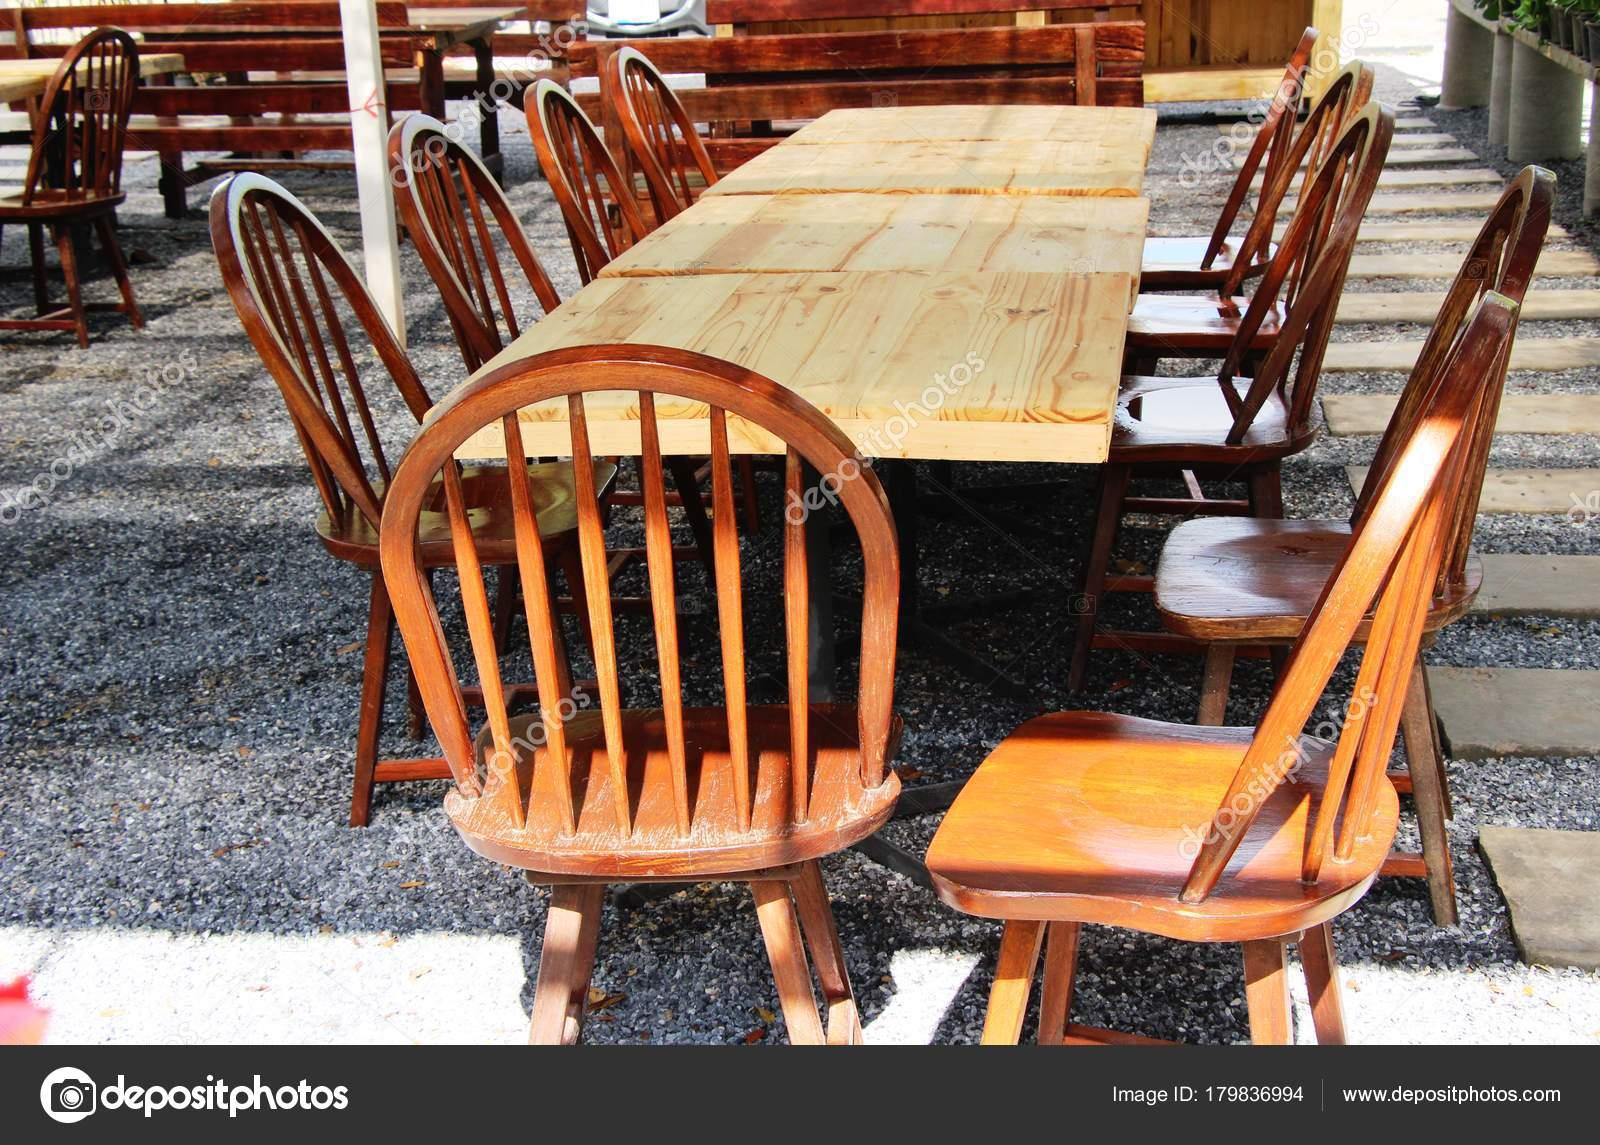 Dining Stoelen Tuin : Houten stoelen in de tuin vintage stijl u2014 stockfoto © seagamess